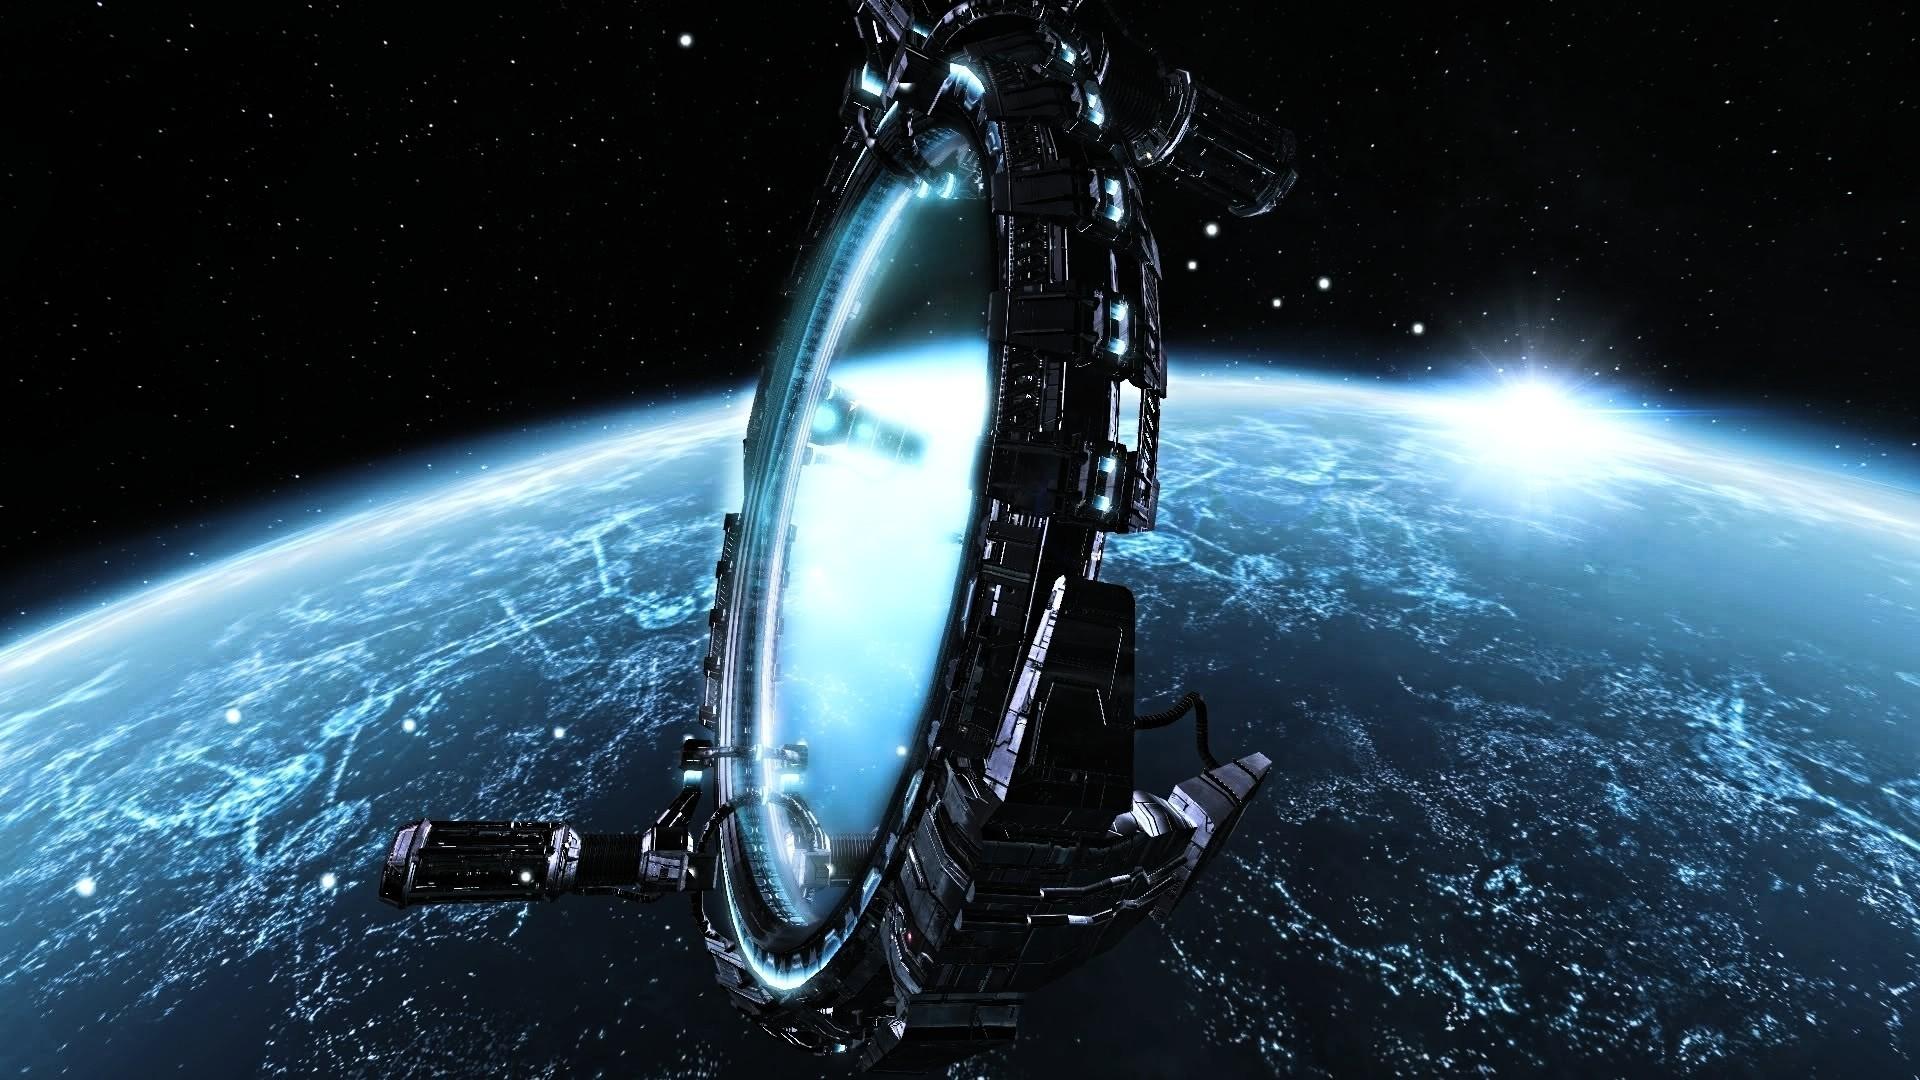 Nave Espacial Planeta Sci Fi Wallpaper 1920x1080 1302652